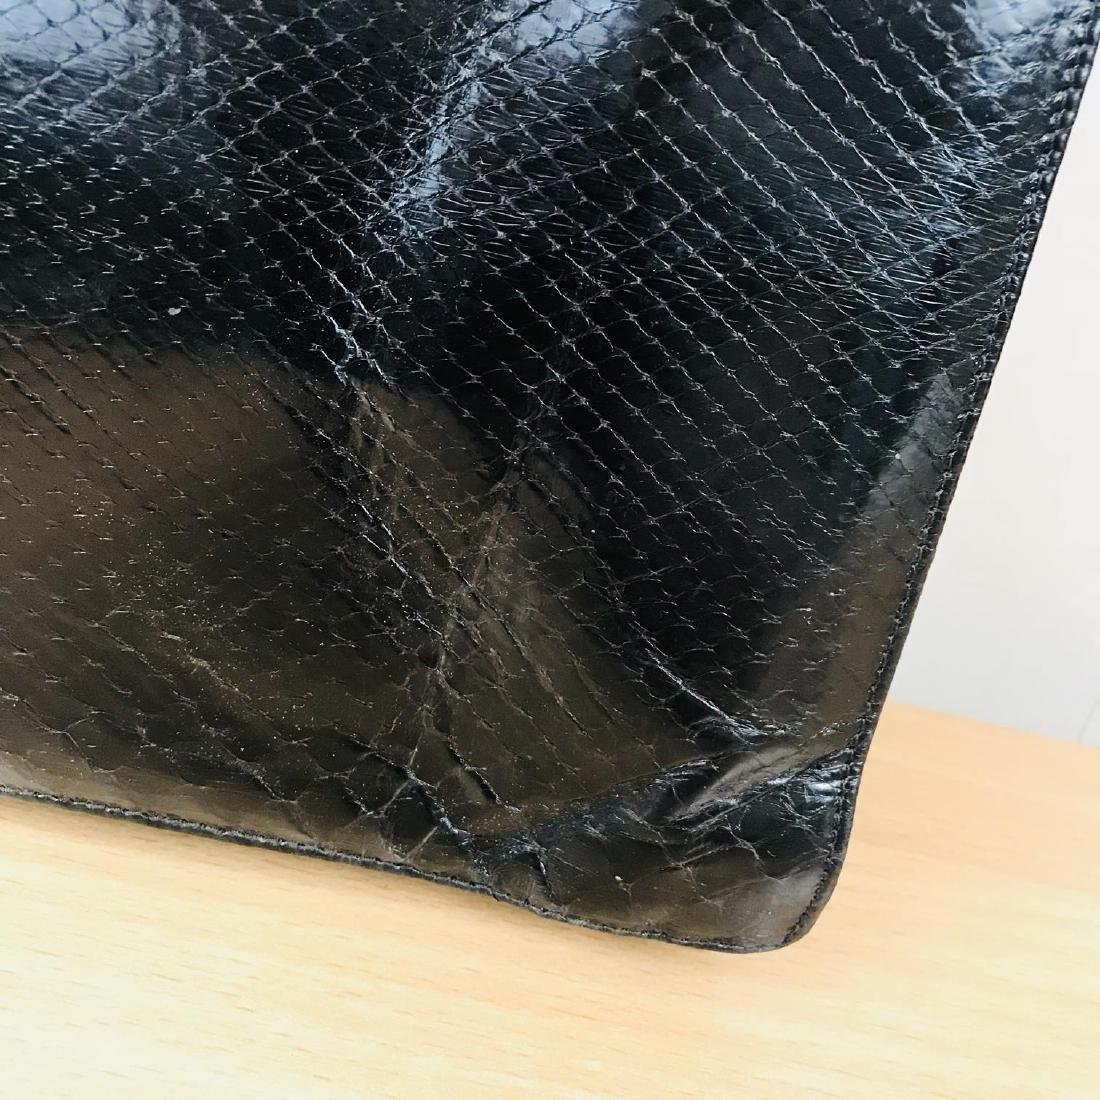 Vintage Black Snakeskin Leather Handbag - 7